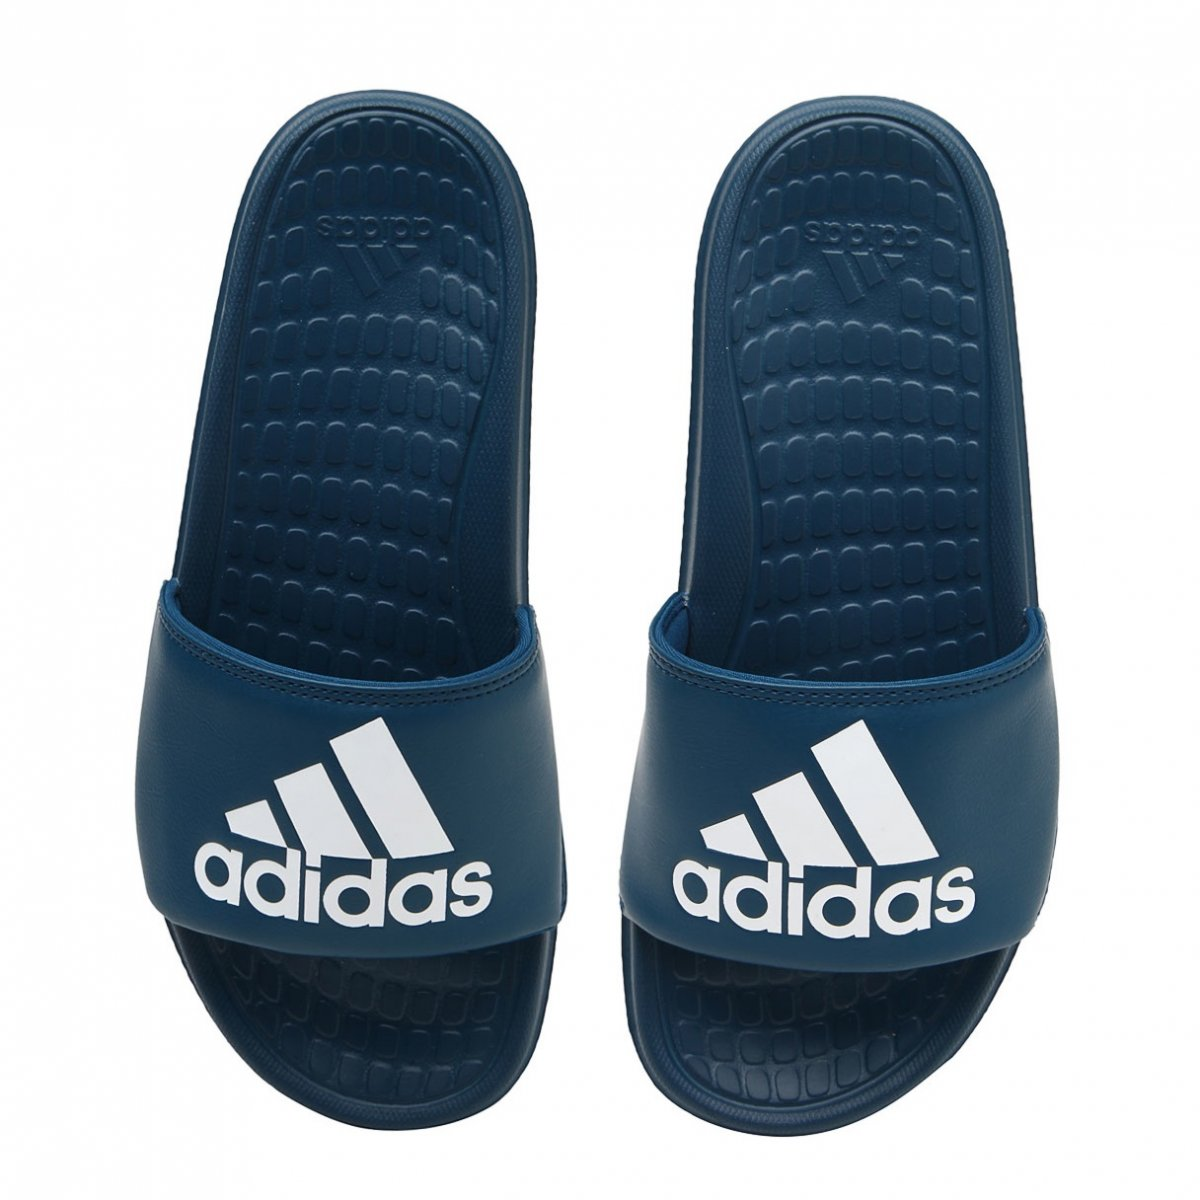 5aa830fabe6 Amplie a imagem. Sandália Masculina Adidas Voloomix Slide  Sandália  Masculina Adidas Voloomix Slide ...